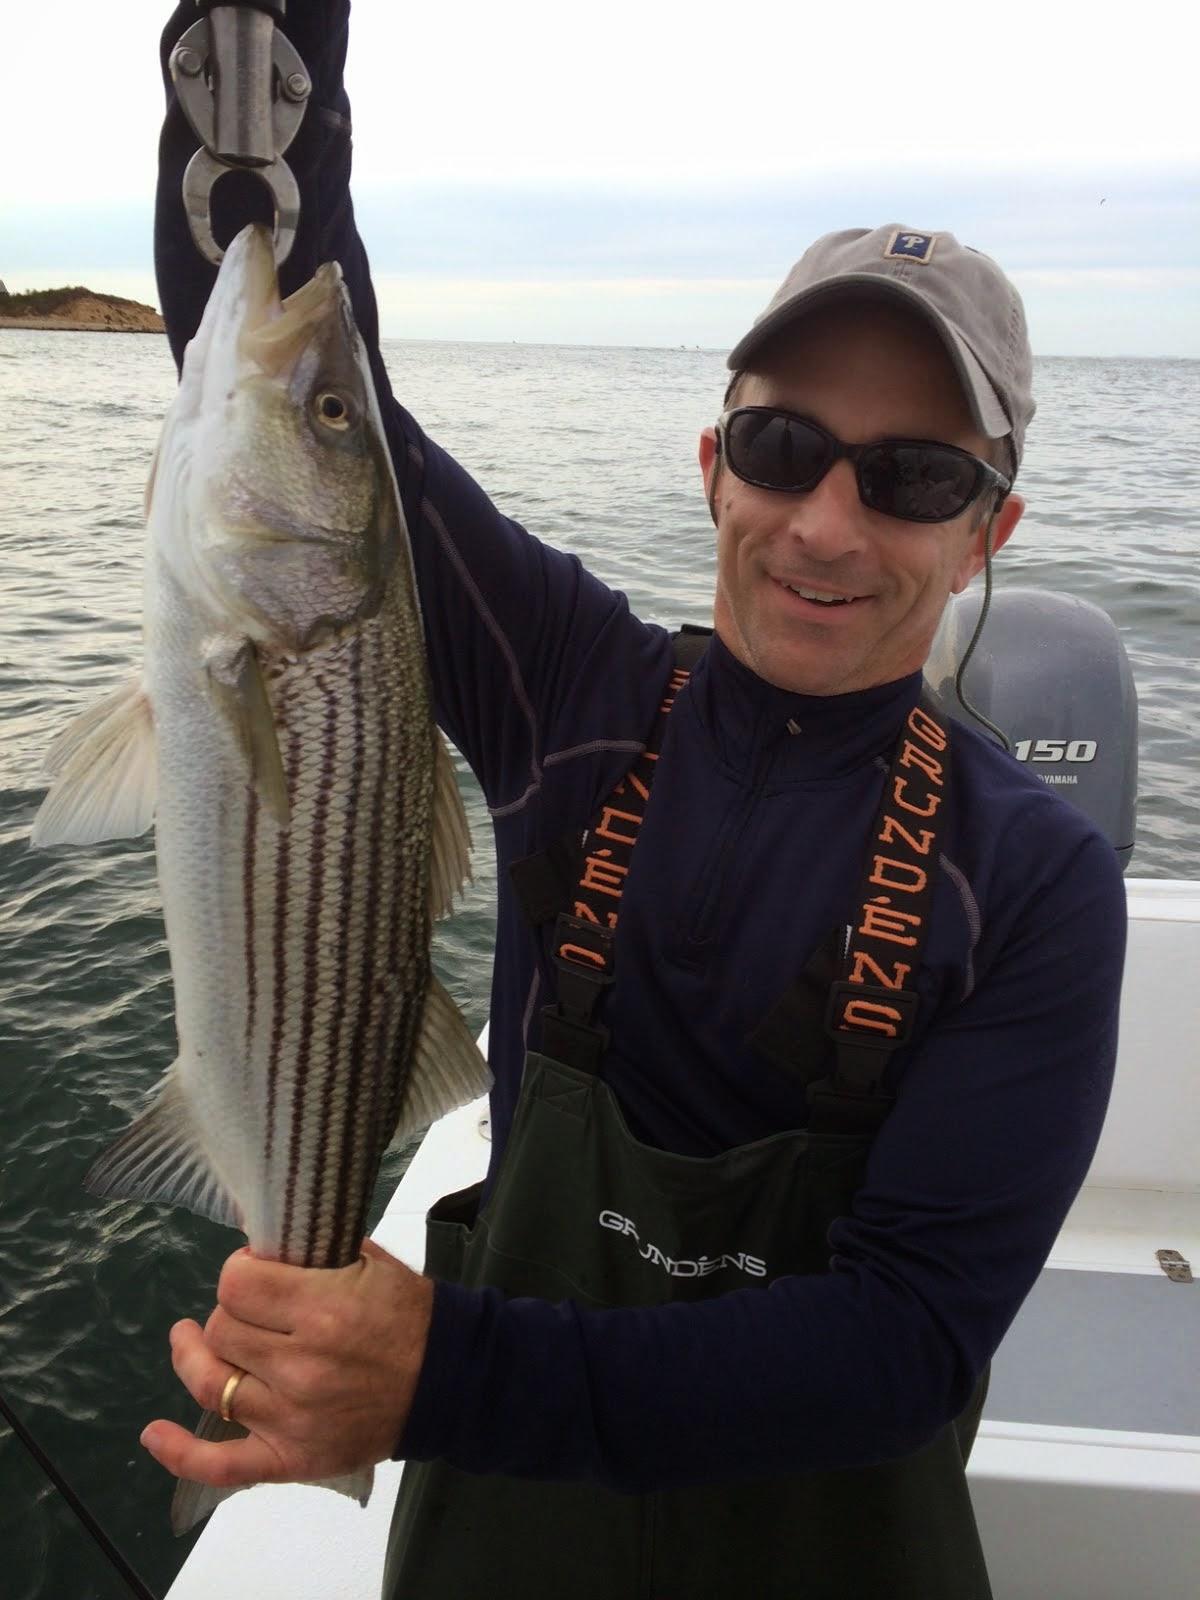 Jersey cape guide service montauk report for Montauk fishing report